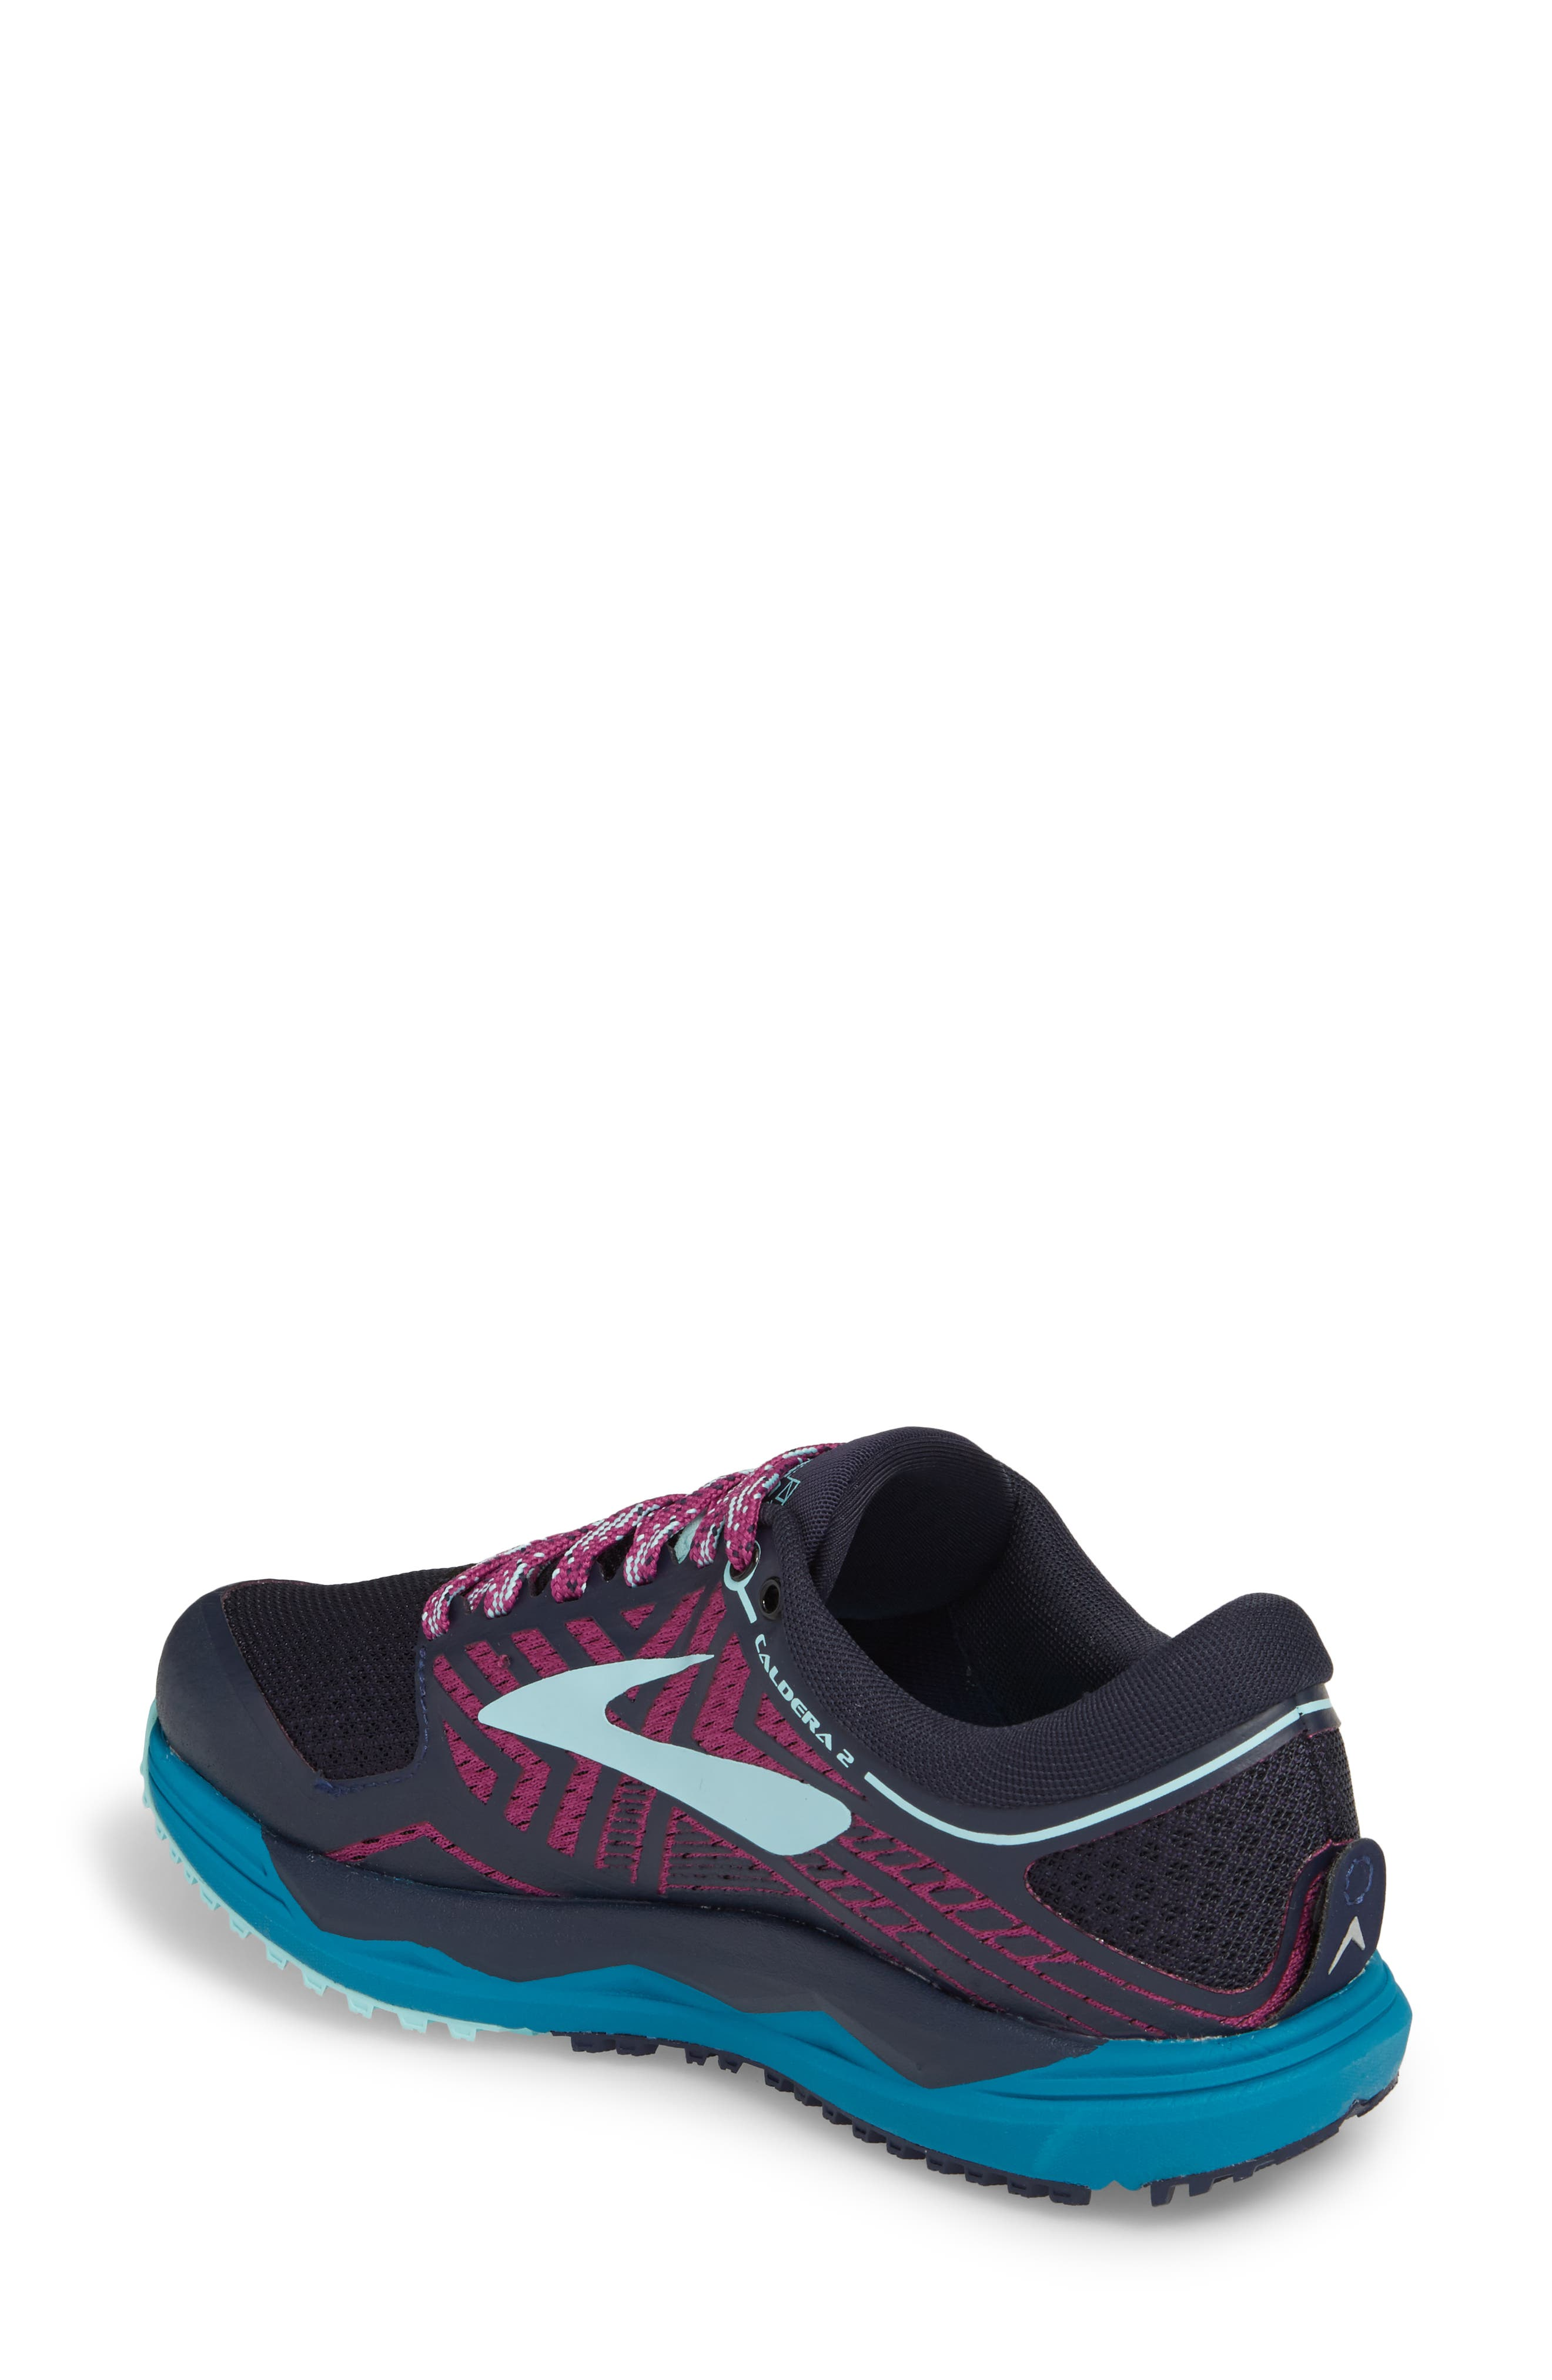 Alternate Image 2  - Brooks Caldera 2 Trail Running Shoe (Women)